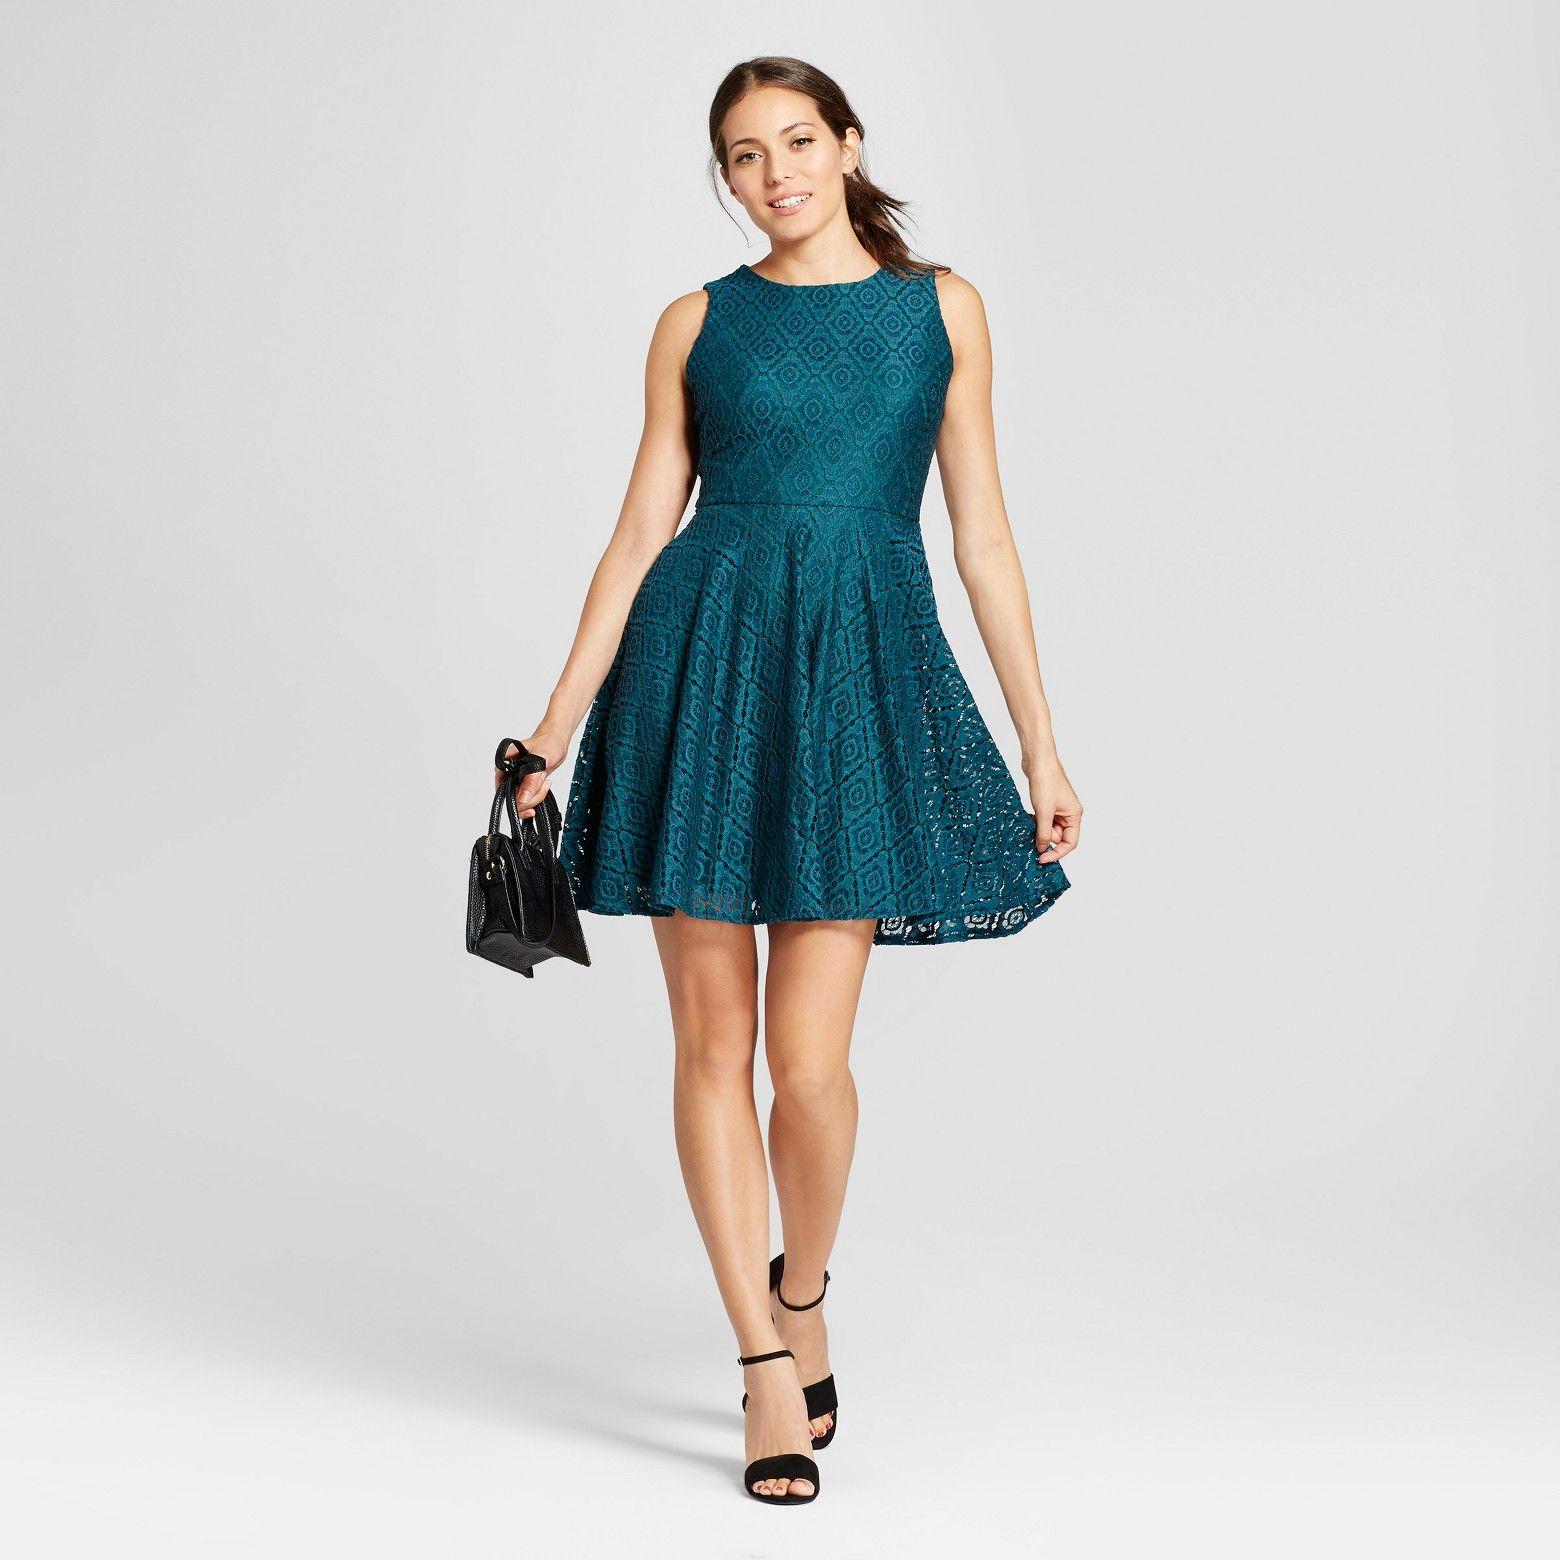 Green dress with lace overlay  Pin by Alyssa Galella on Gabriela u Lara Dresses  Pinterest  Tank